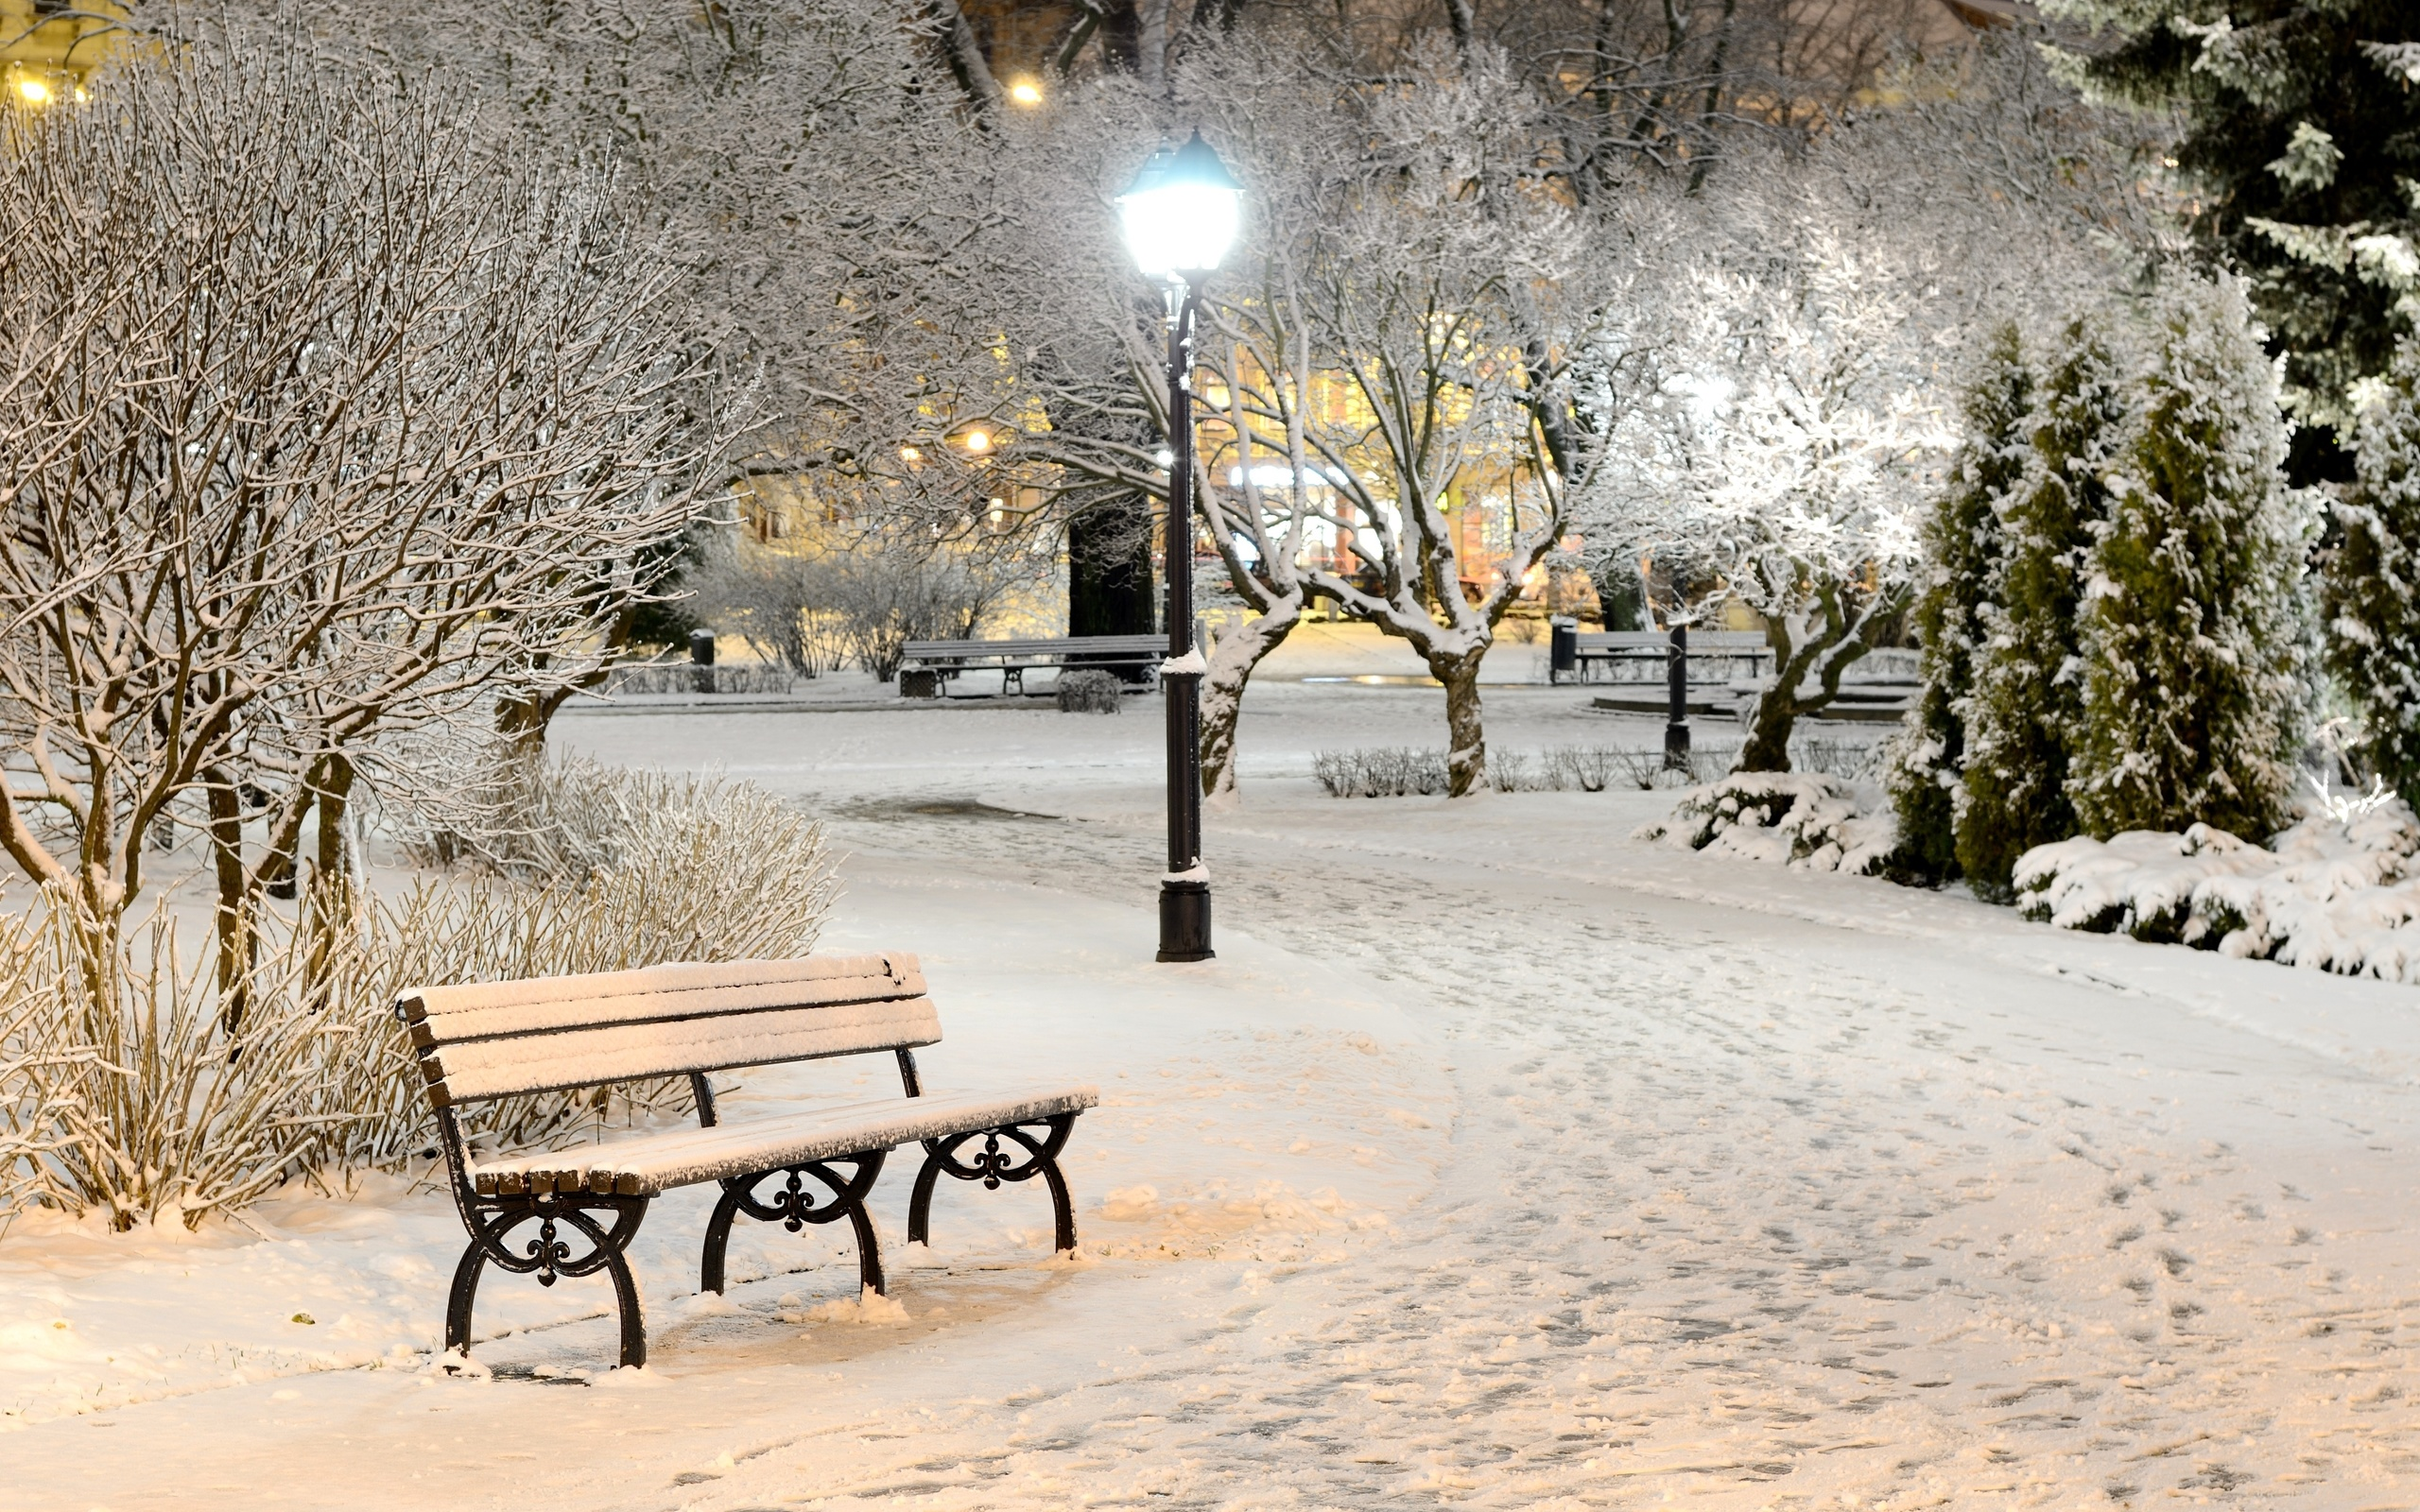 присутствуют красивые картинки зима снег город животное, обеспечивающее заводчика